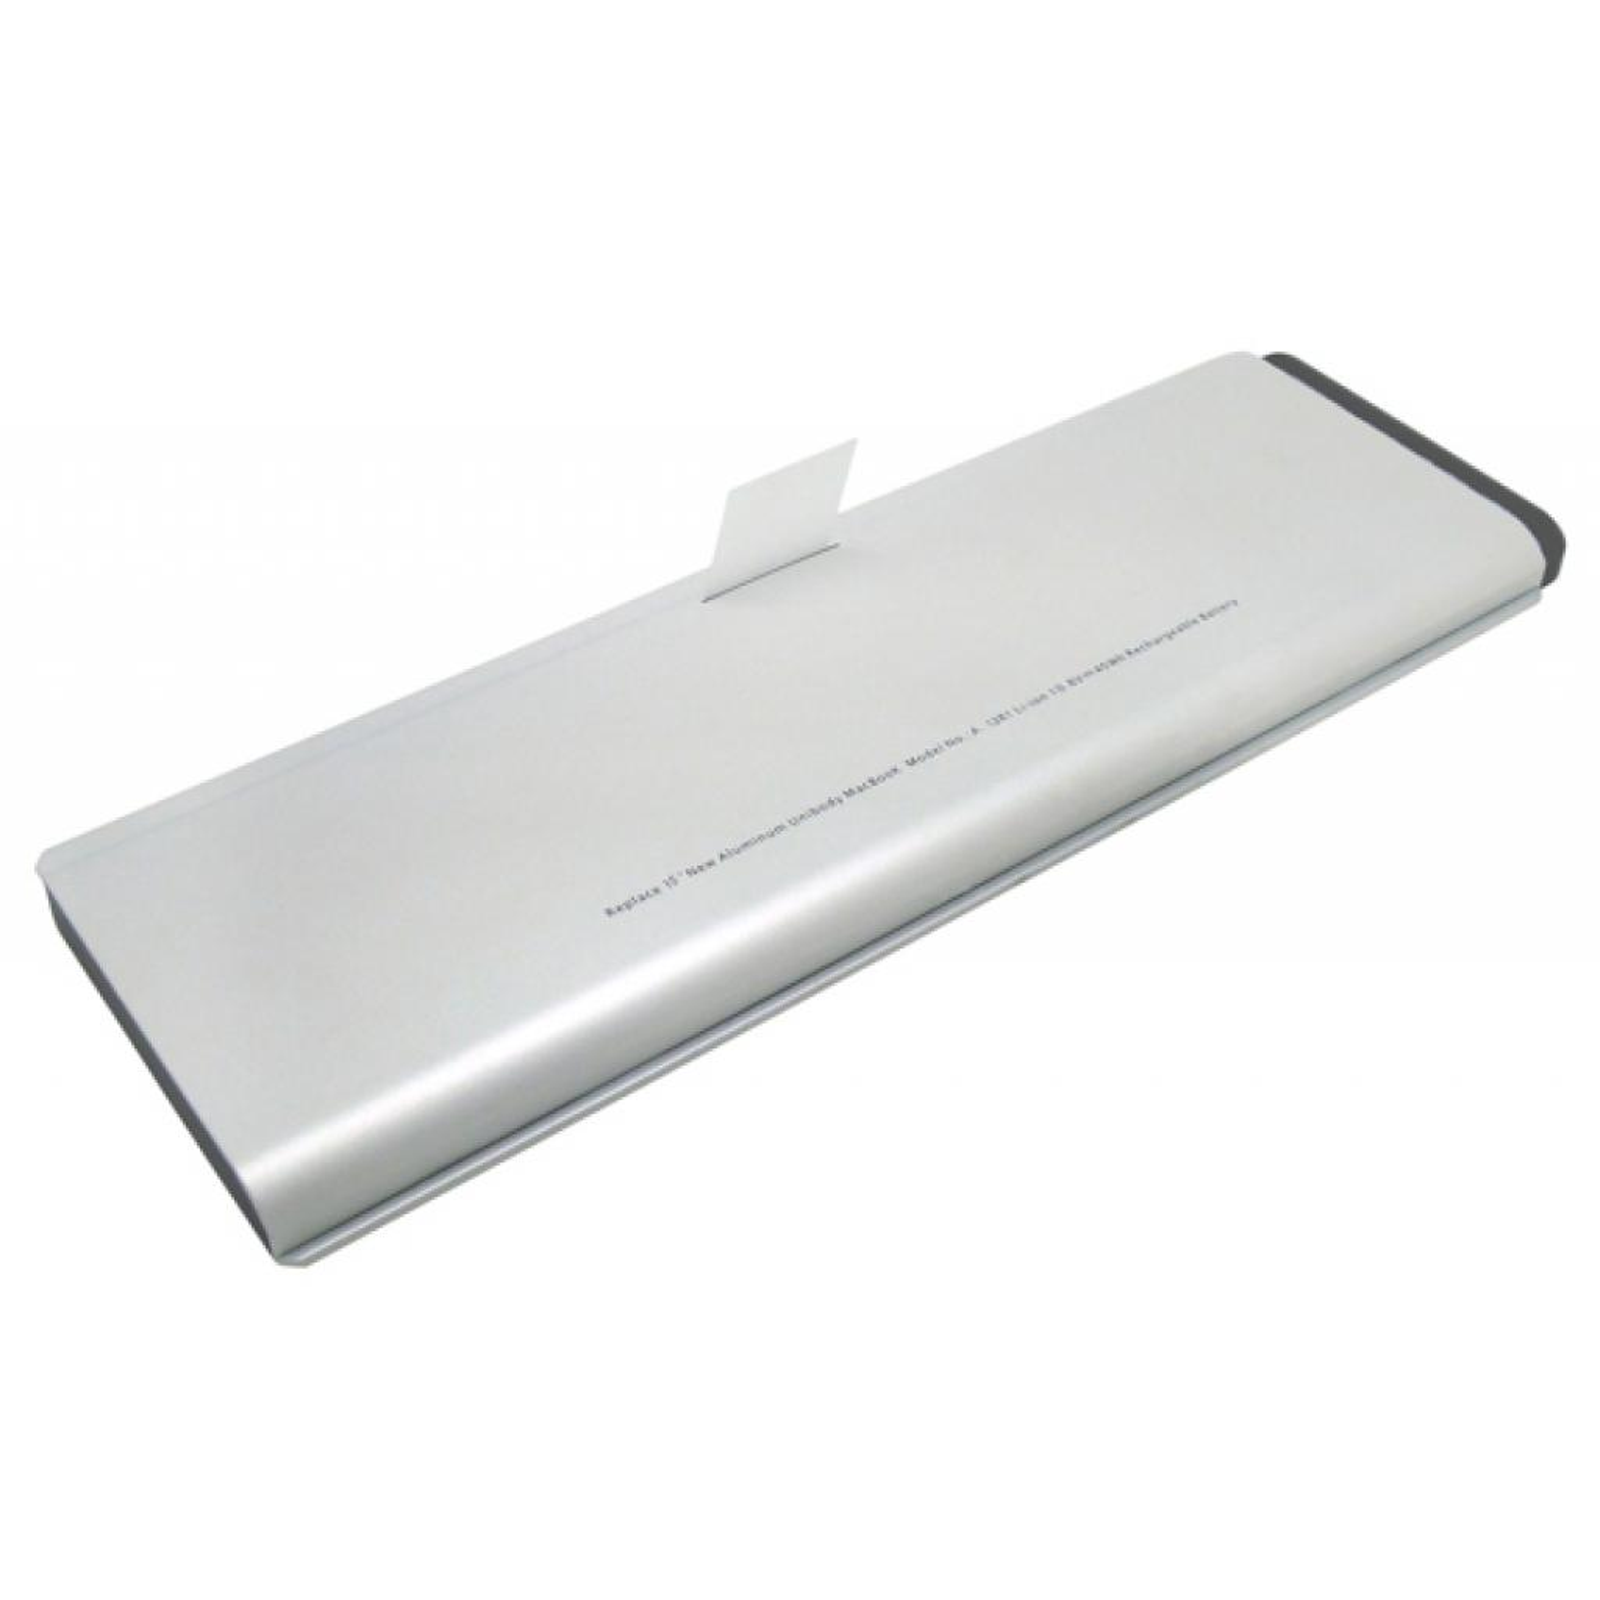 "Аккумулятор для ноутбука APPLE MacBook Pro 15"" (A1281) 10.8V 5200mAh PowerPlant (NB00000096)"